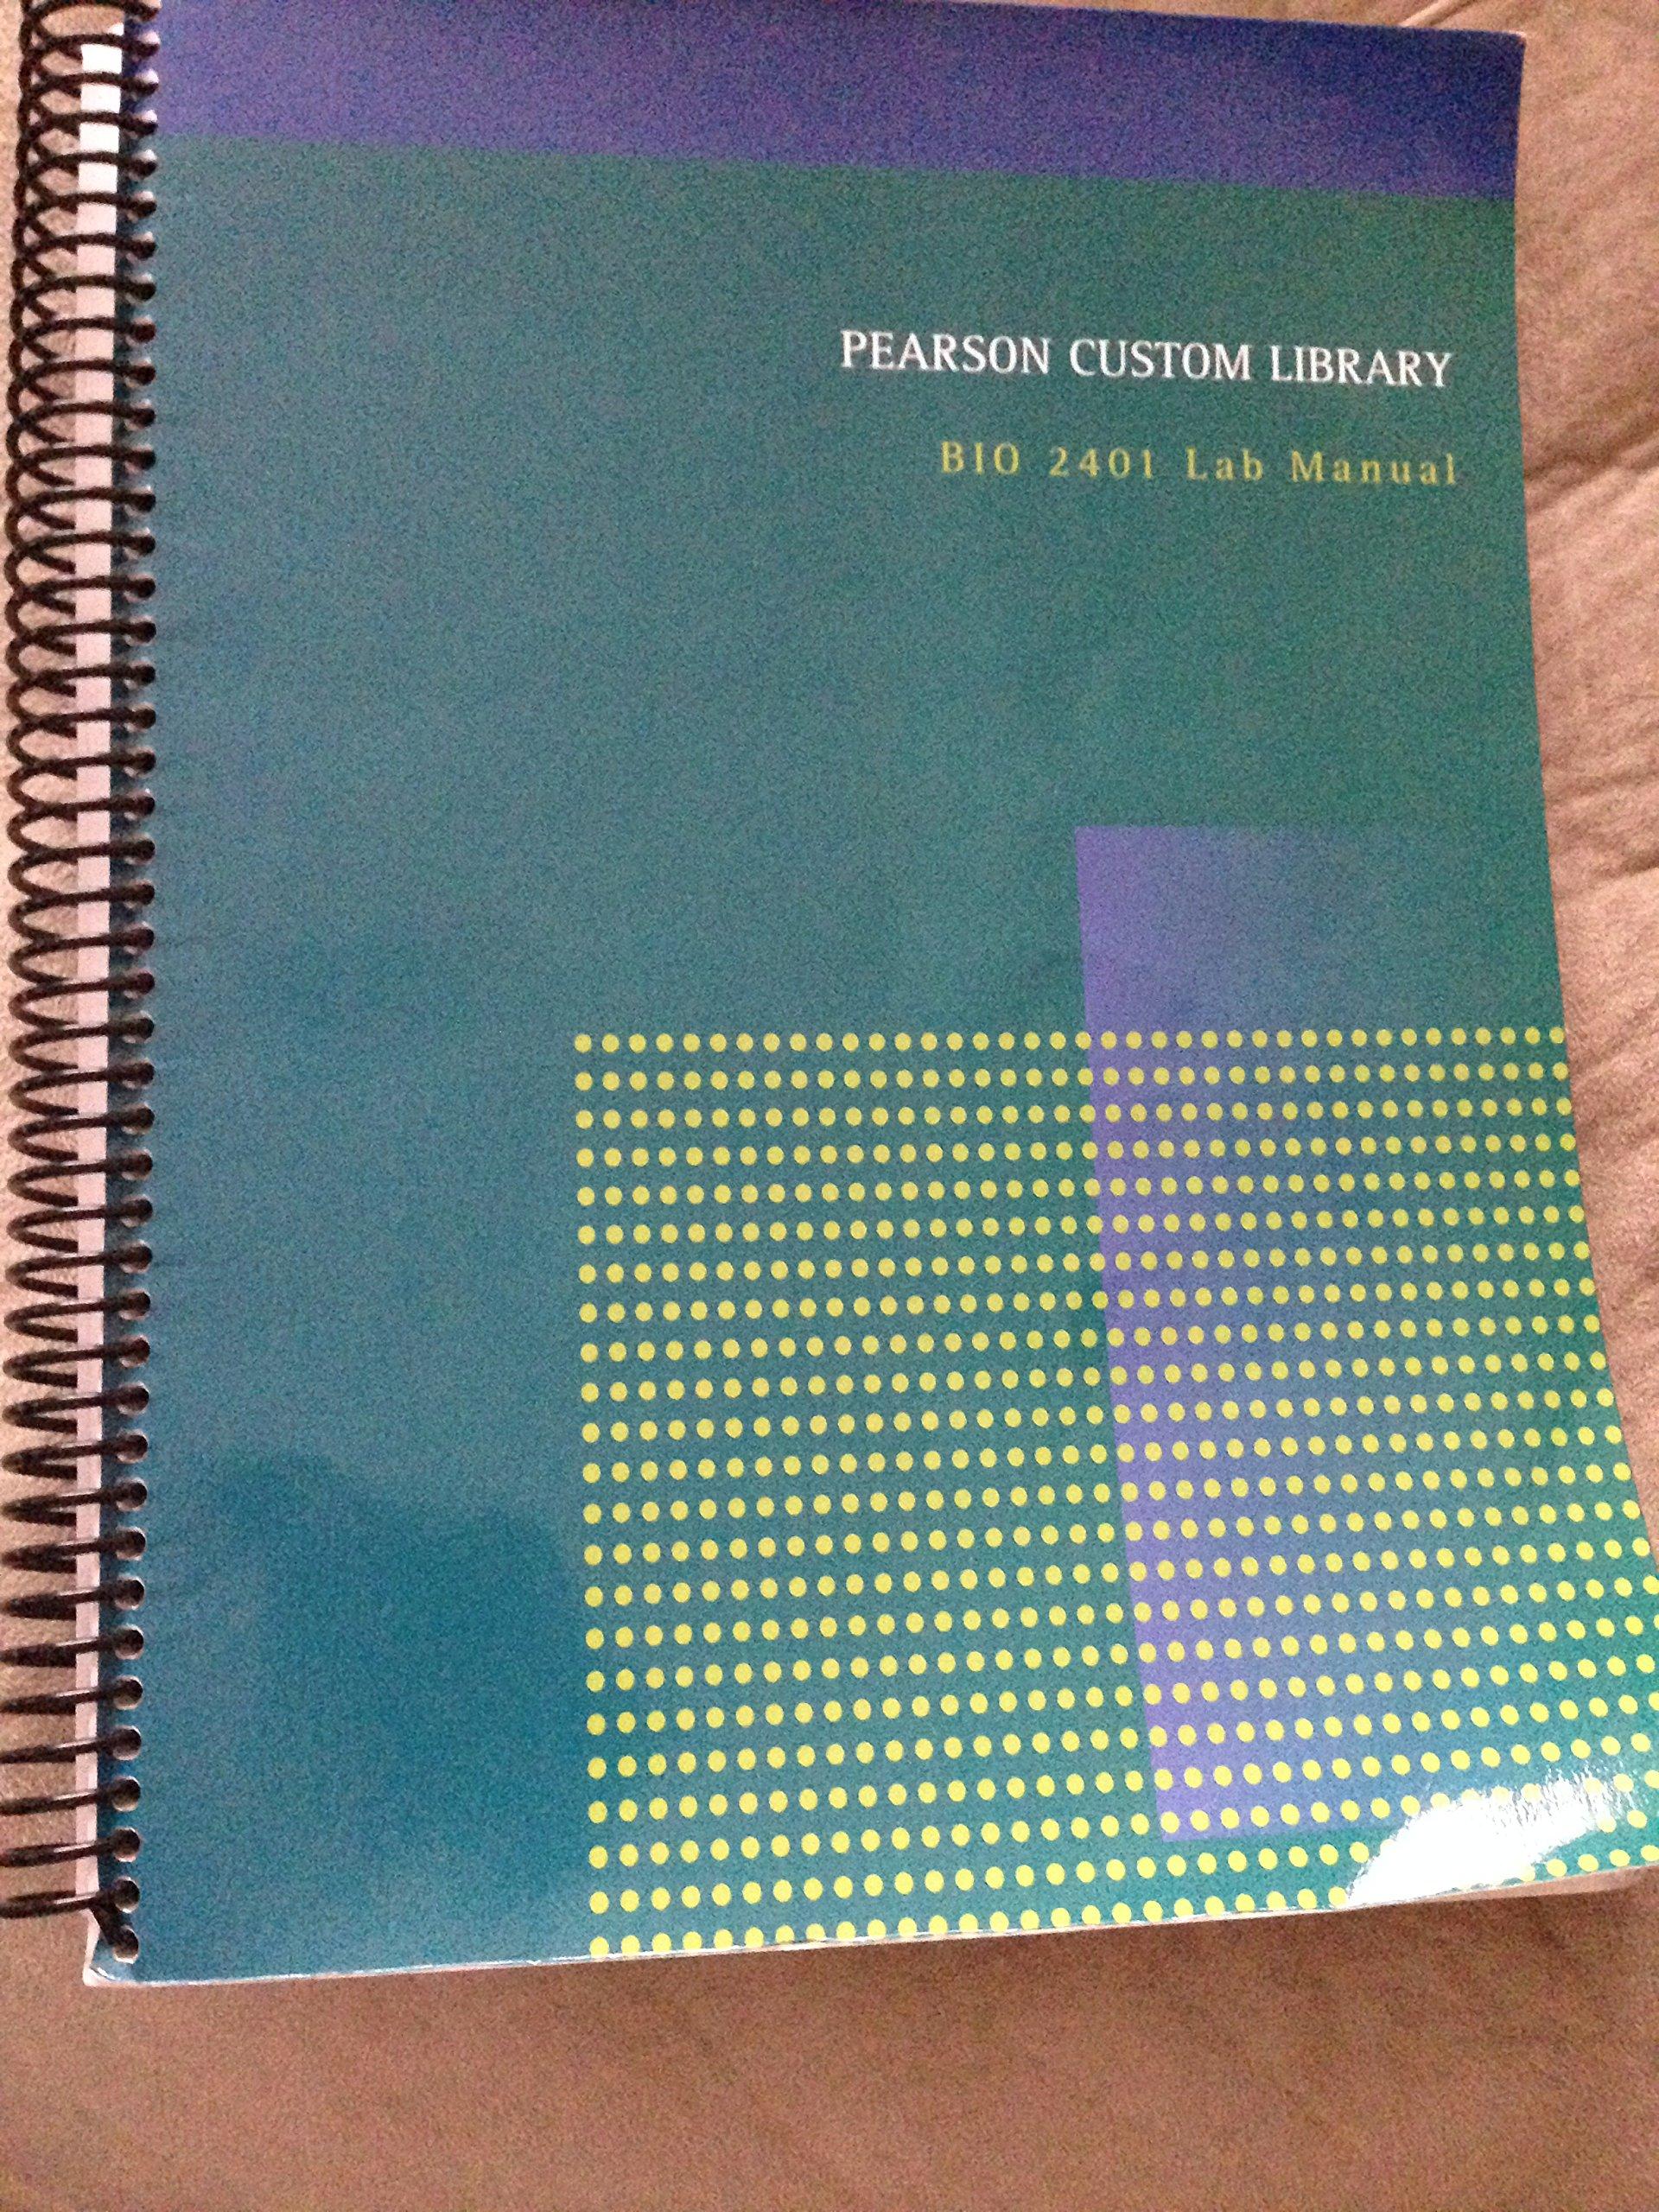 Pearson Custom Library BIO 2401 Lab Manual: Pearson Learning Solutions:  9781269124744: Amazon.com: Books